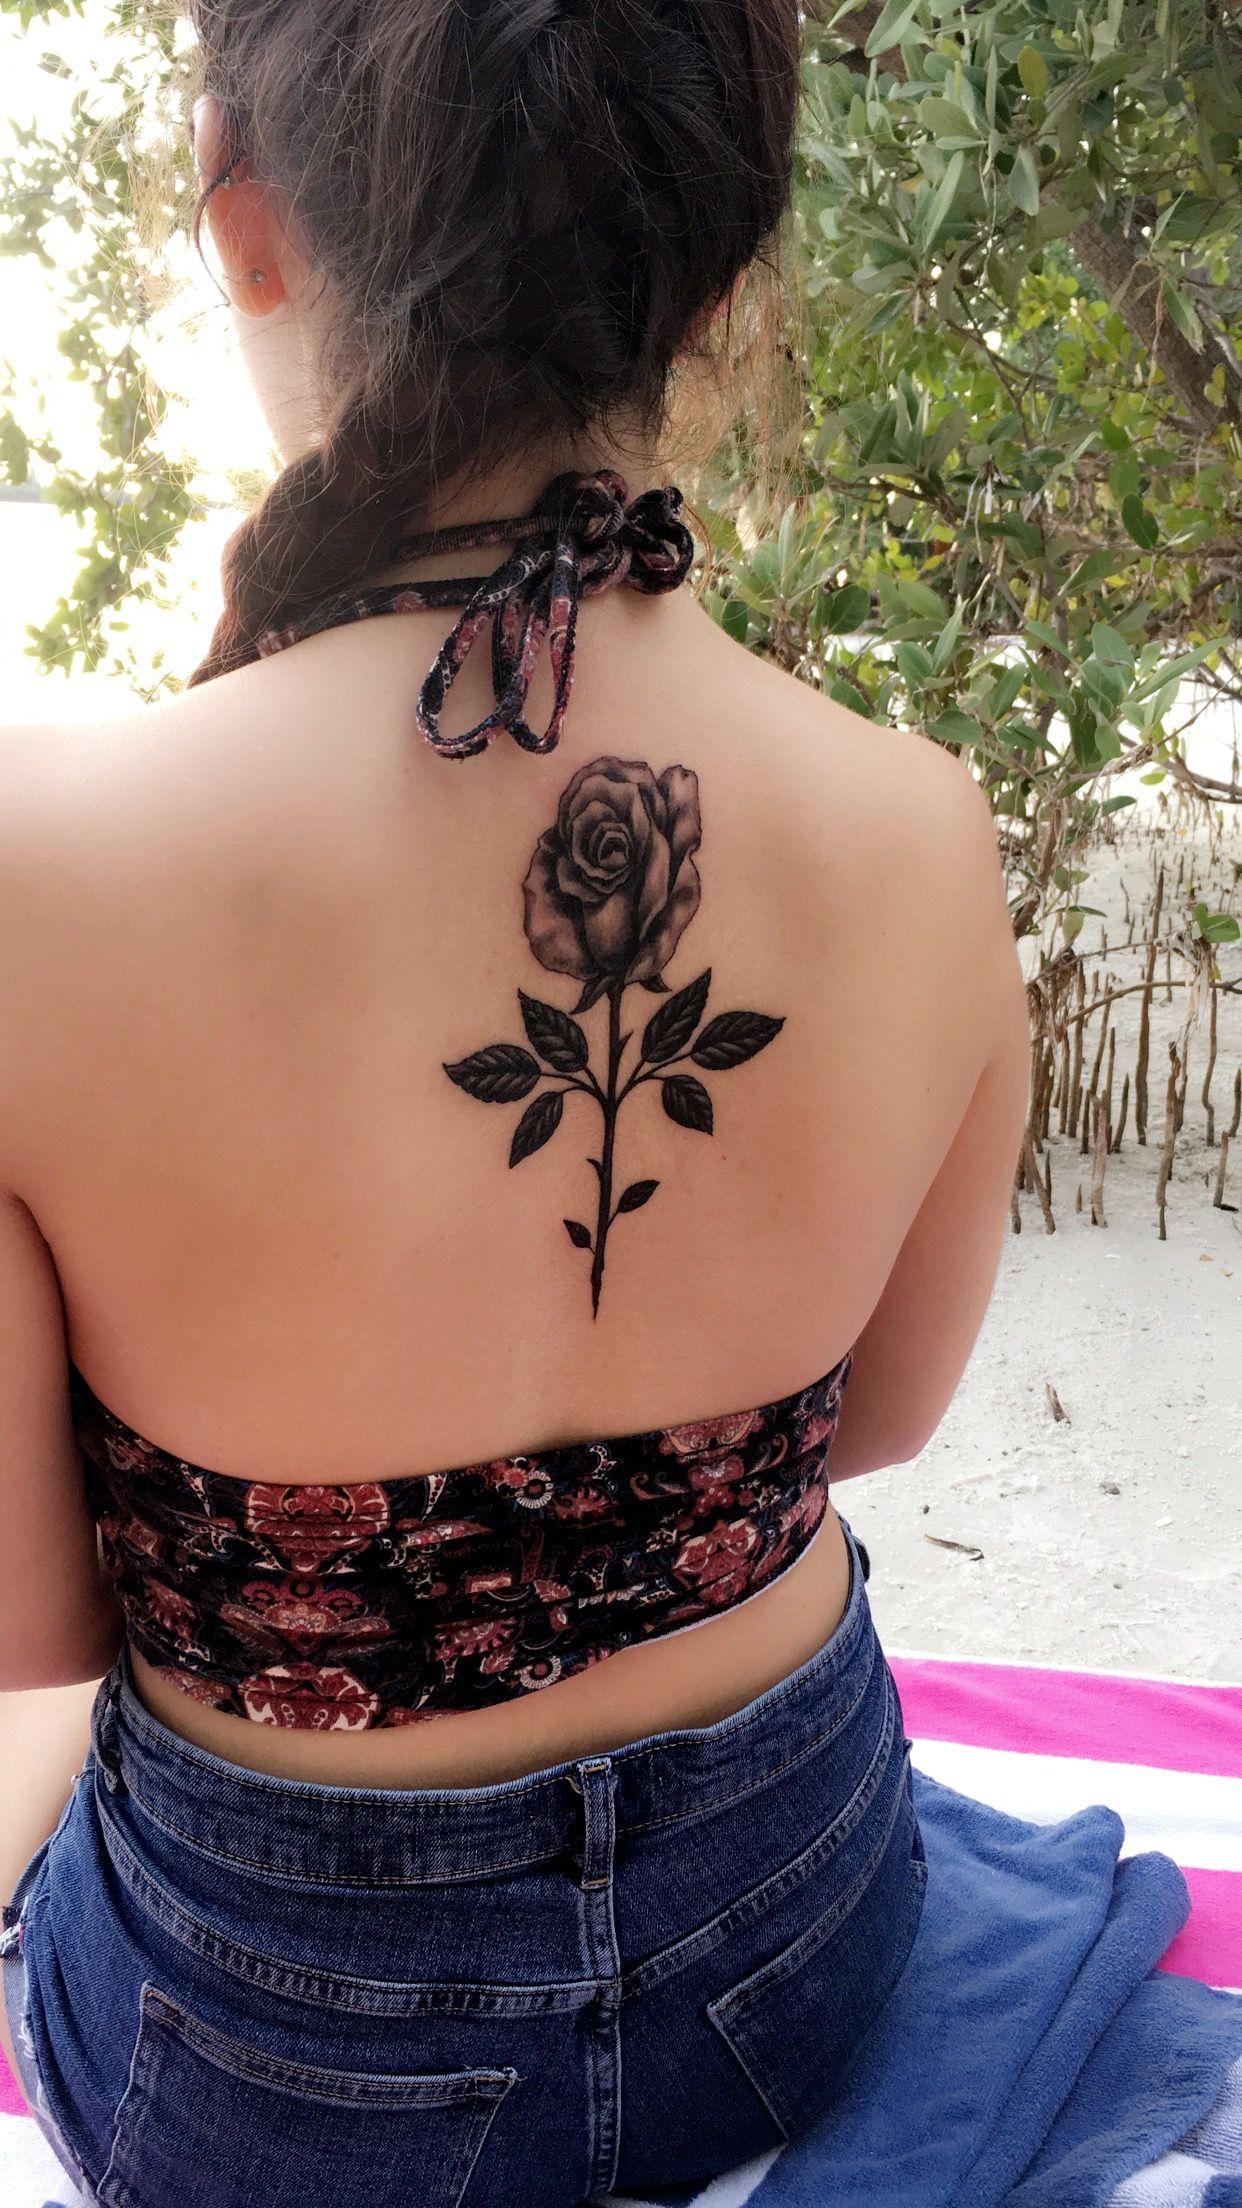 Black rose back tattoo rose tattoos back tattoo trendy